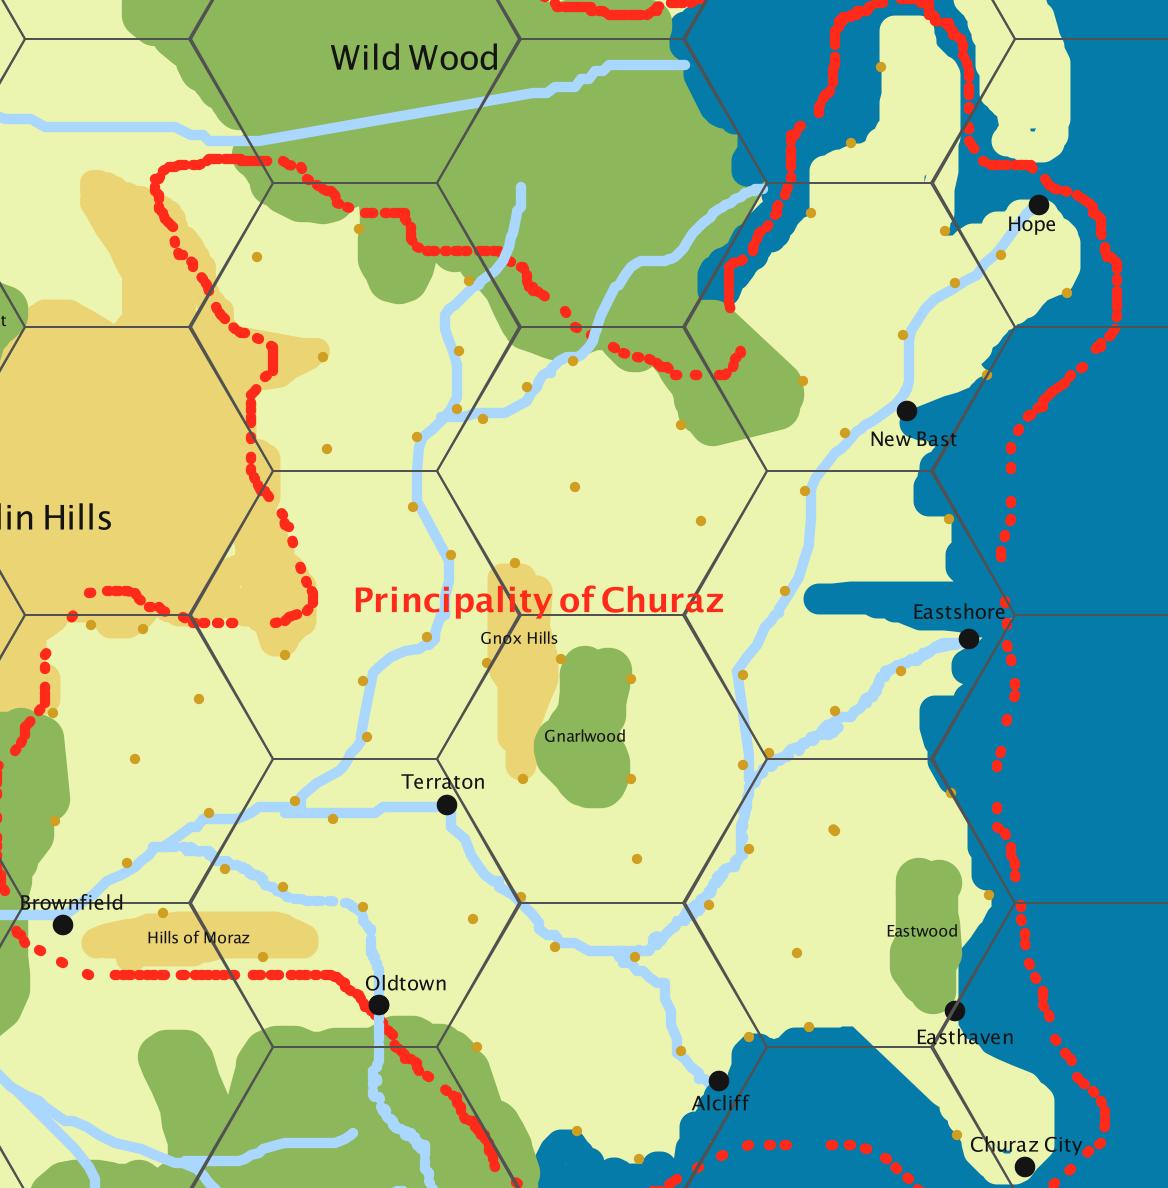 Principality of churaz